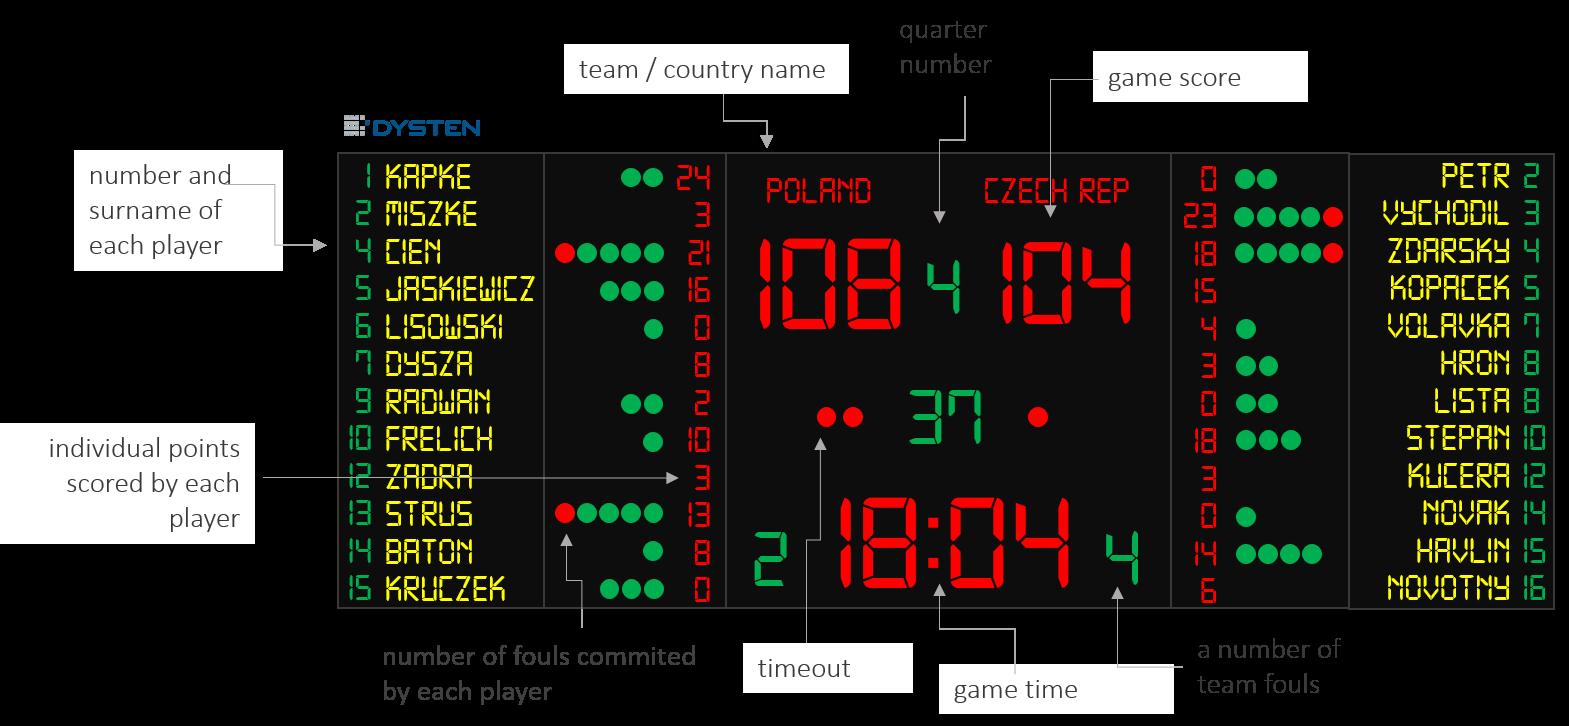 Basketball scoreboard clean clipart banner transparent download LED scoreboards - basketball, volleyball, football, hockey banner transparent download